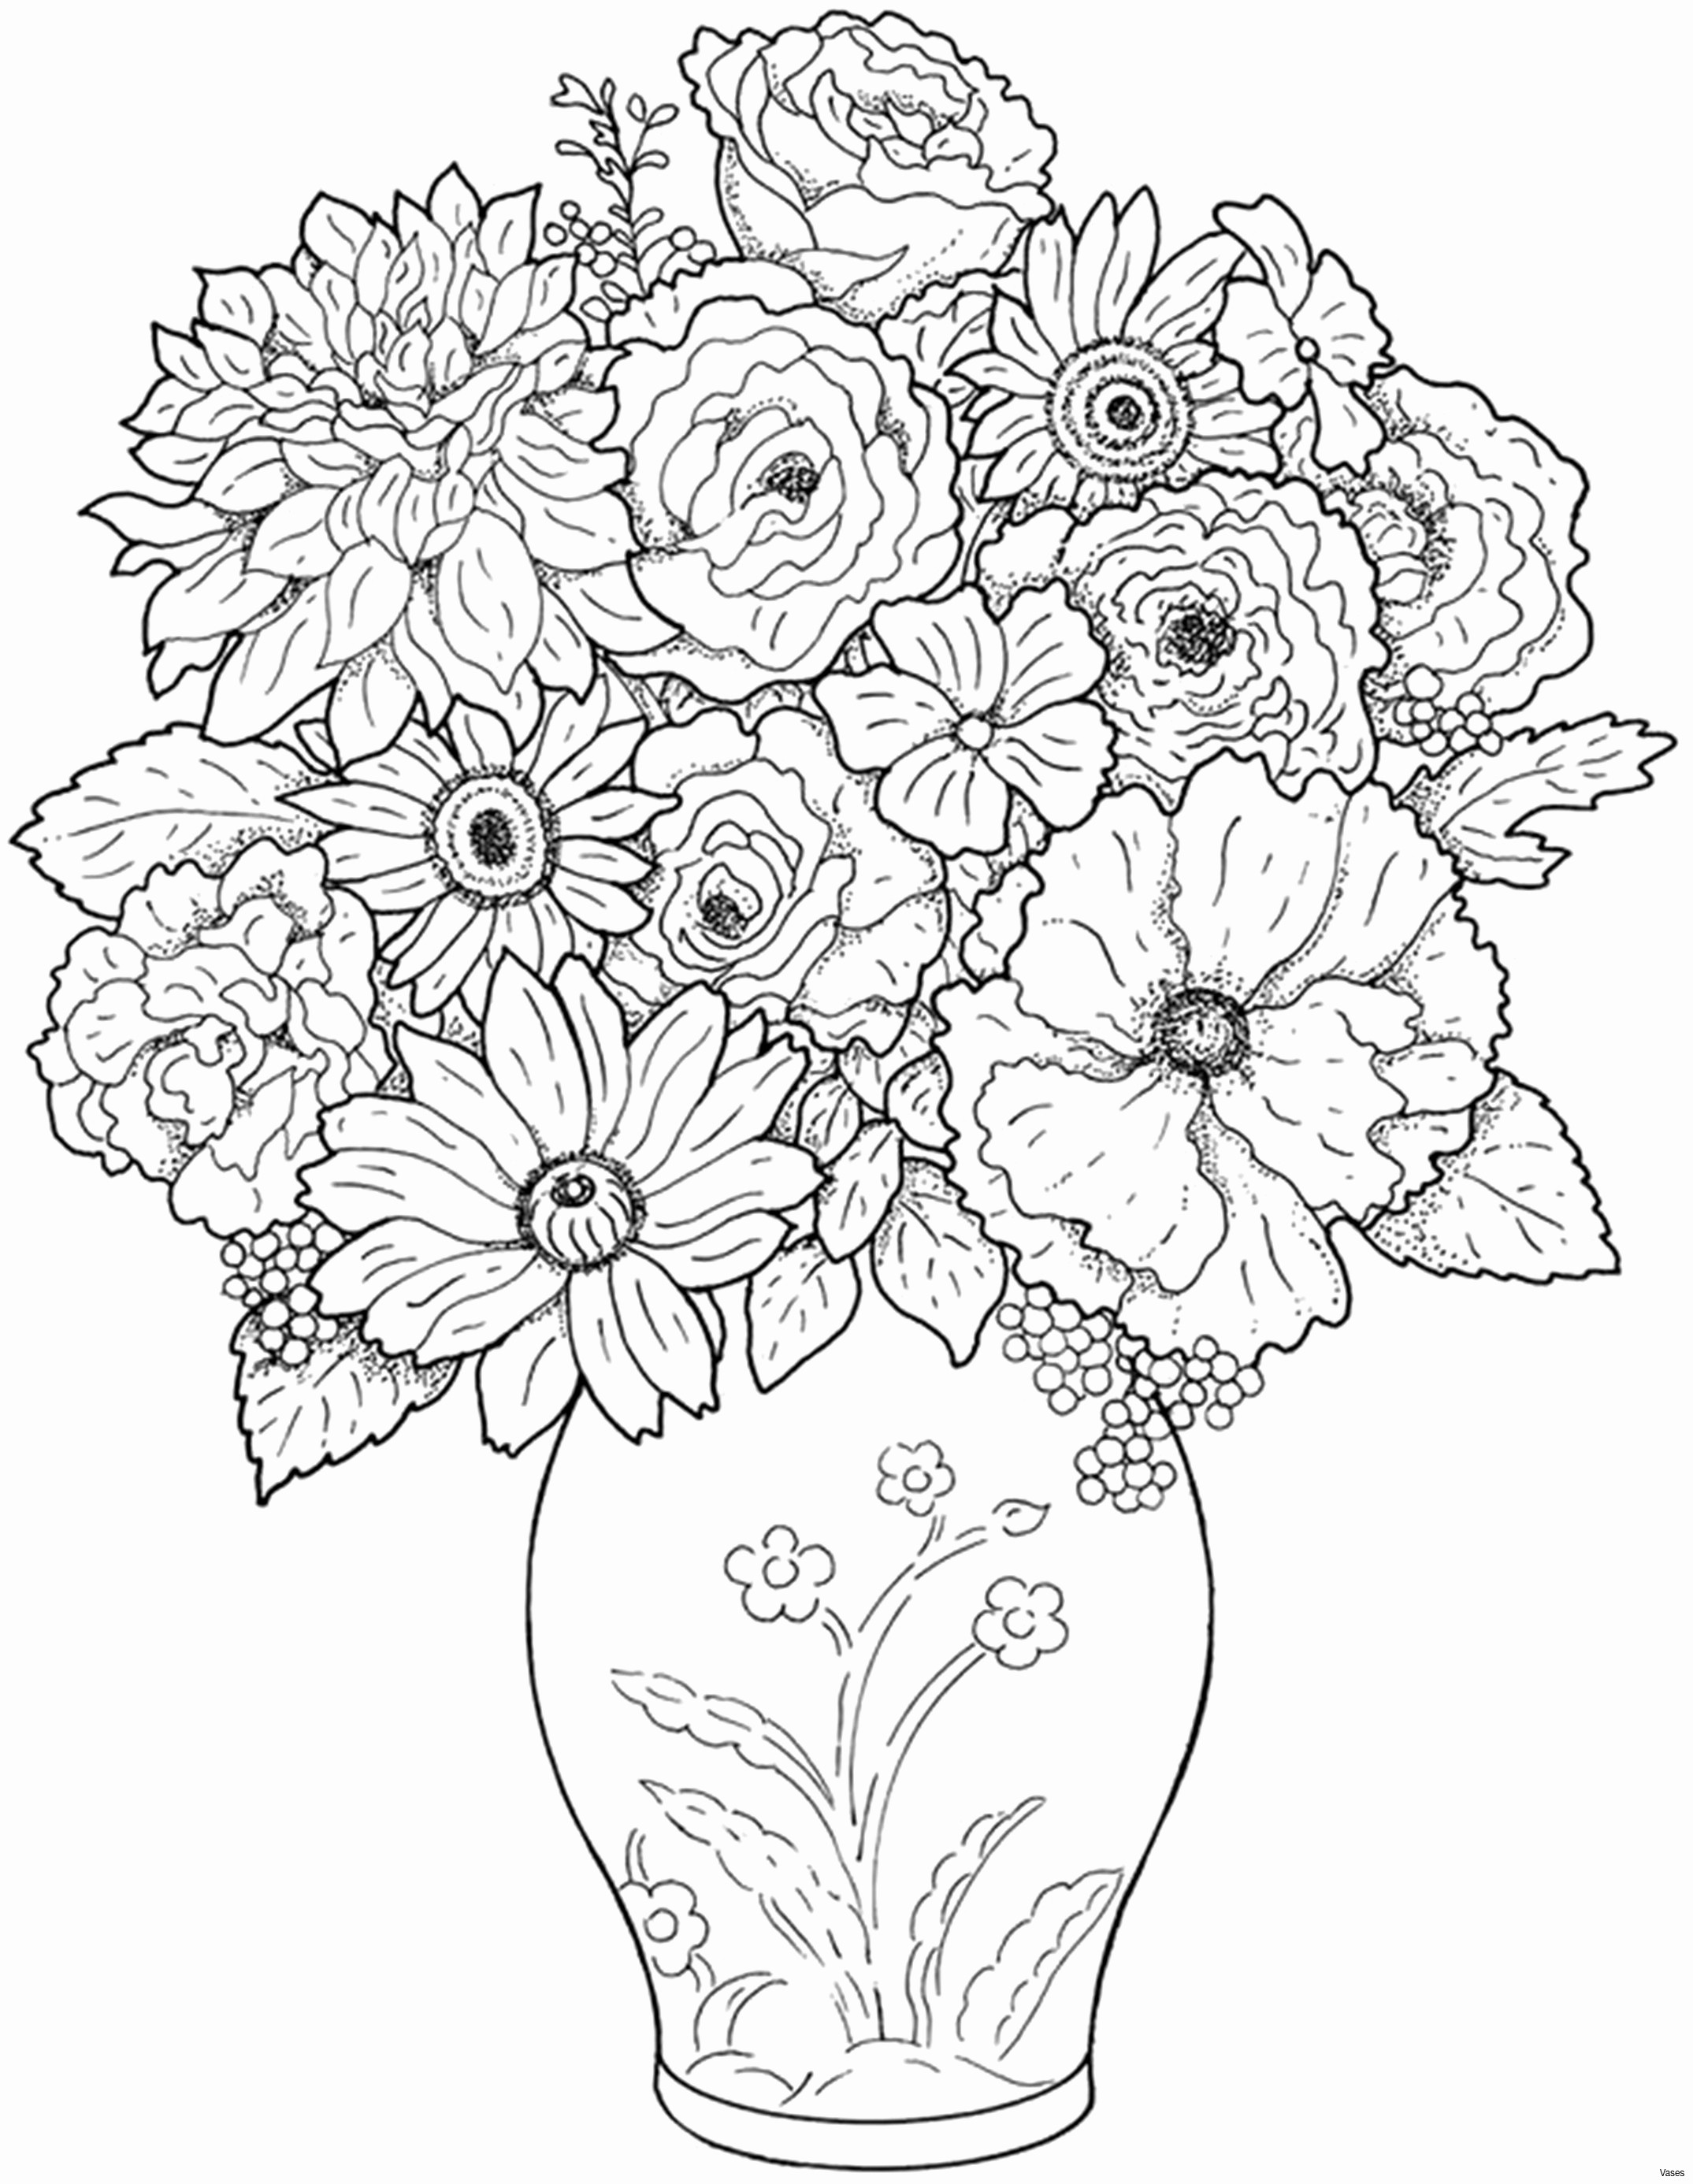 22 Lovely Van Gogh Vase 2021 free download van gogh vase of sunflower coloring page lovely vincent van gogh sunflowers coloring regarding gallery of sunflower coloring page lovely vincent van gogh sunflowers coloring page sunflowers